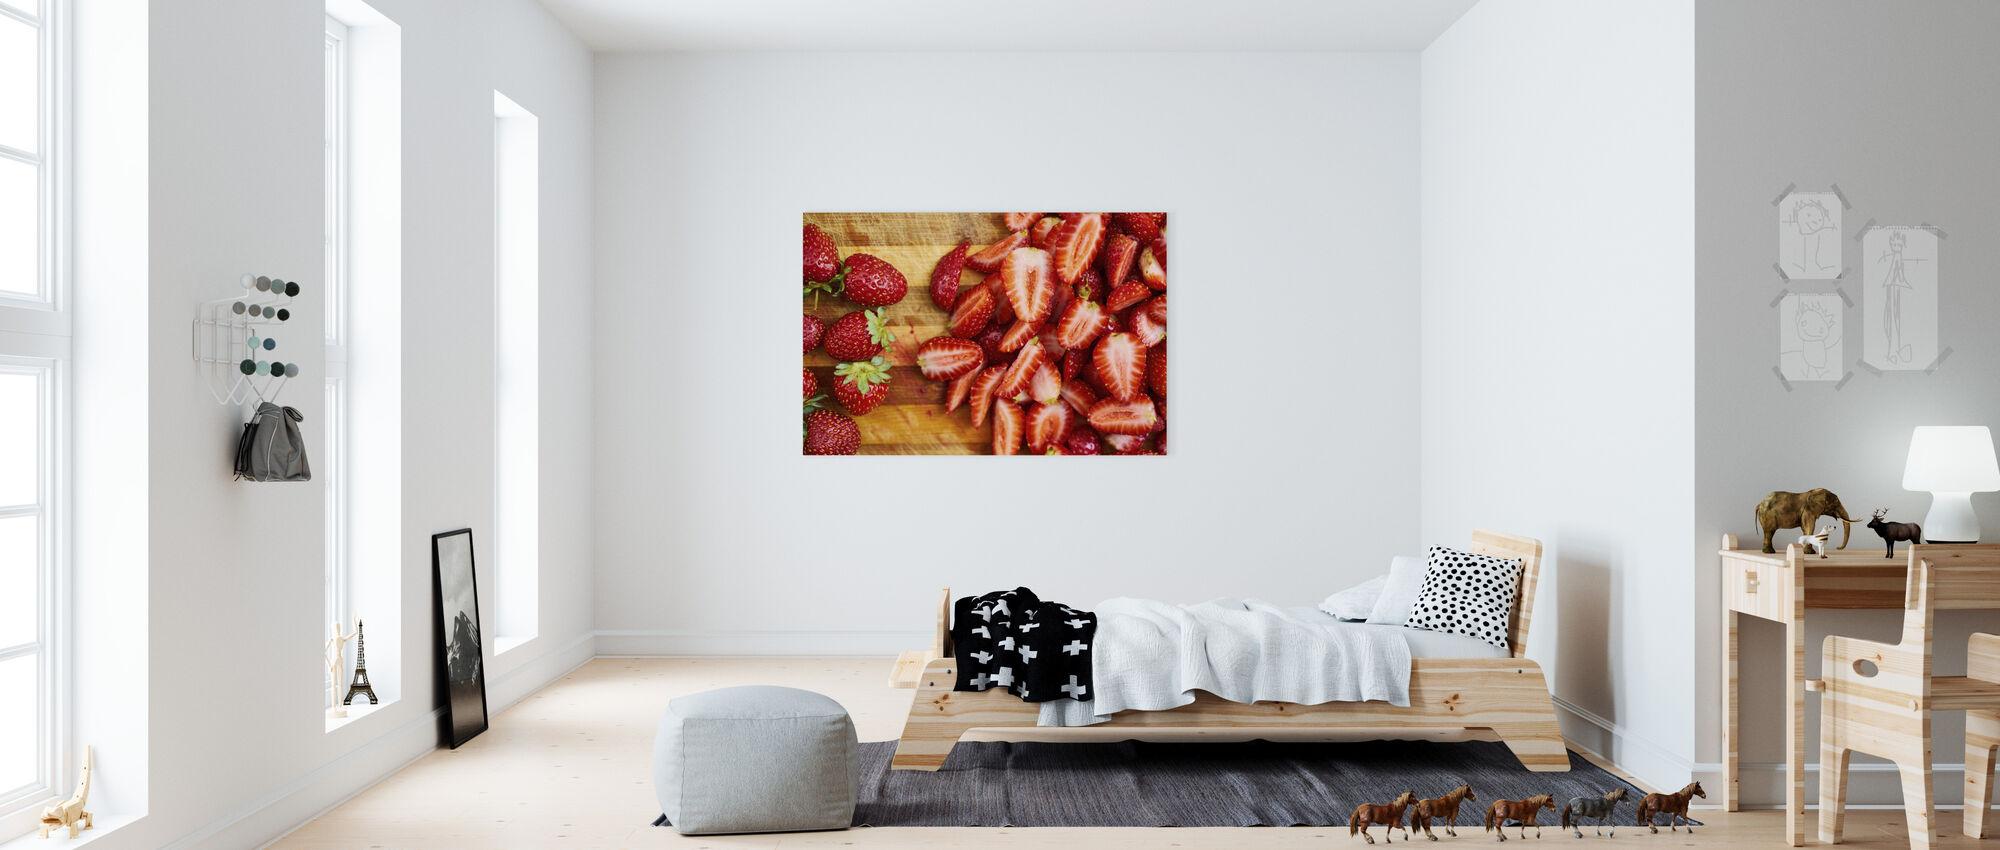 Strawberry Fruits - Canvas print - Kids Room